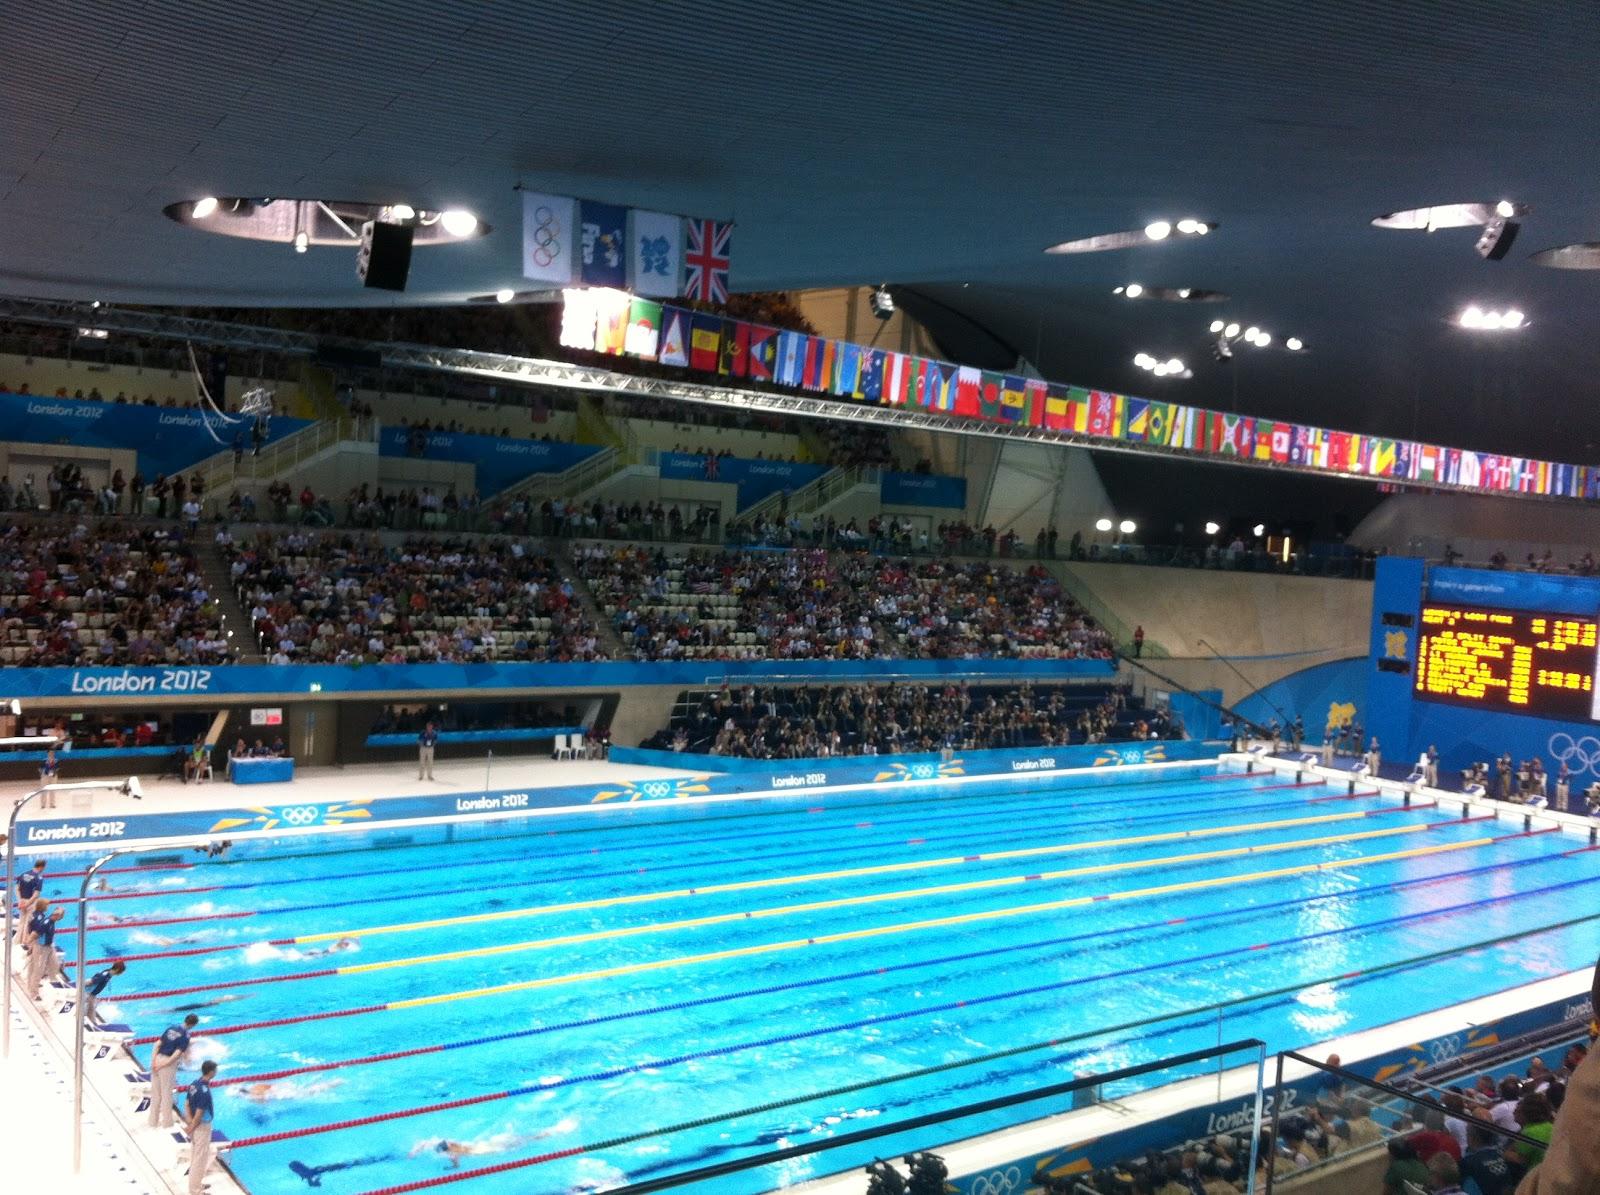 Olympic Swimming Pool 2012: London 2012: July 2012